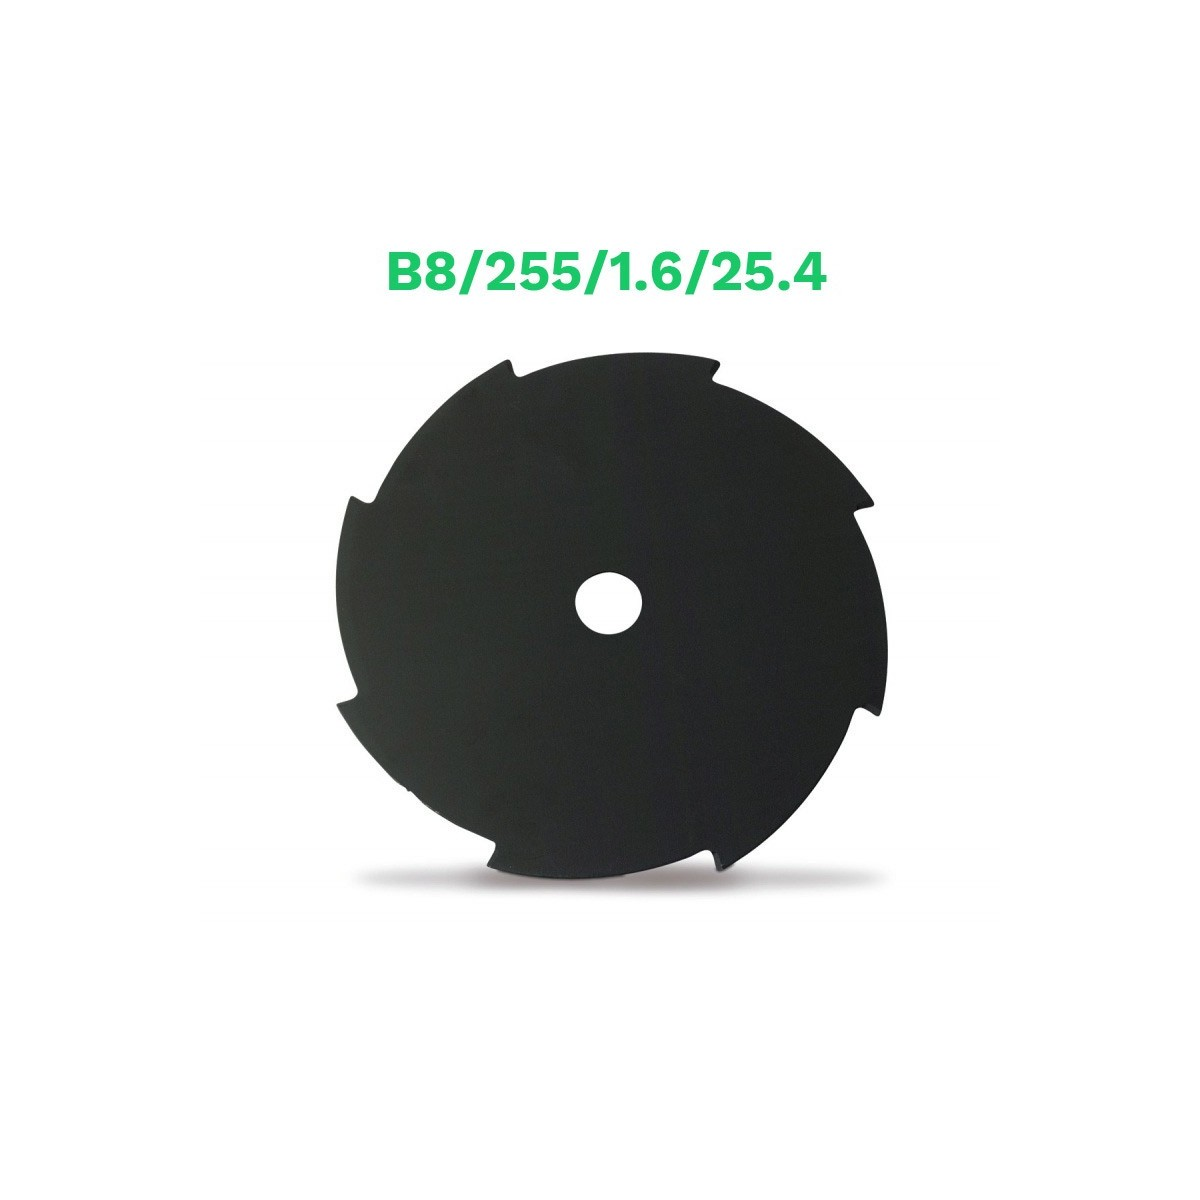 Echo disco metalico 8 dientes b8/255/1.6/25.4